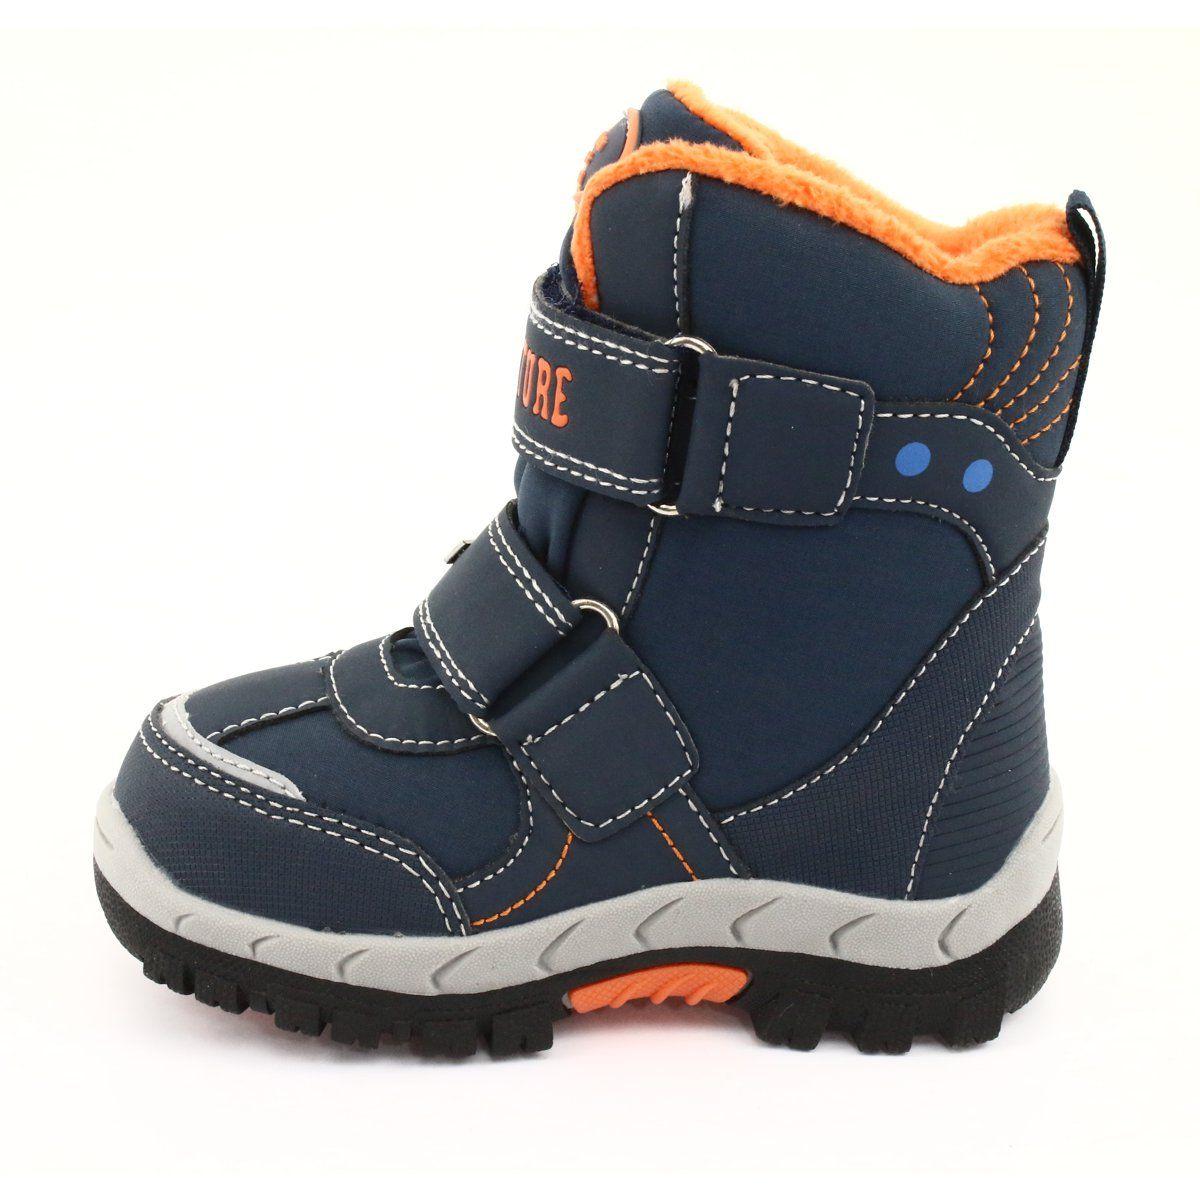 American Club American Kozaki Buty Z Membrana Rl35 Granatowe Pomaranczowe Boots Childrens Boots Childrens Shoes